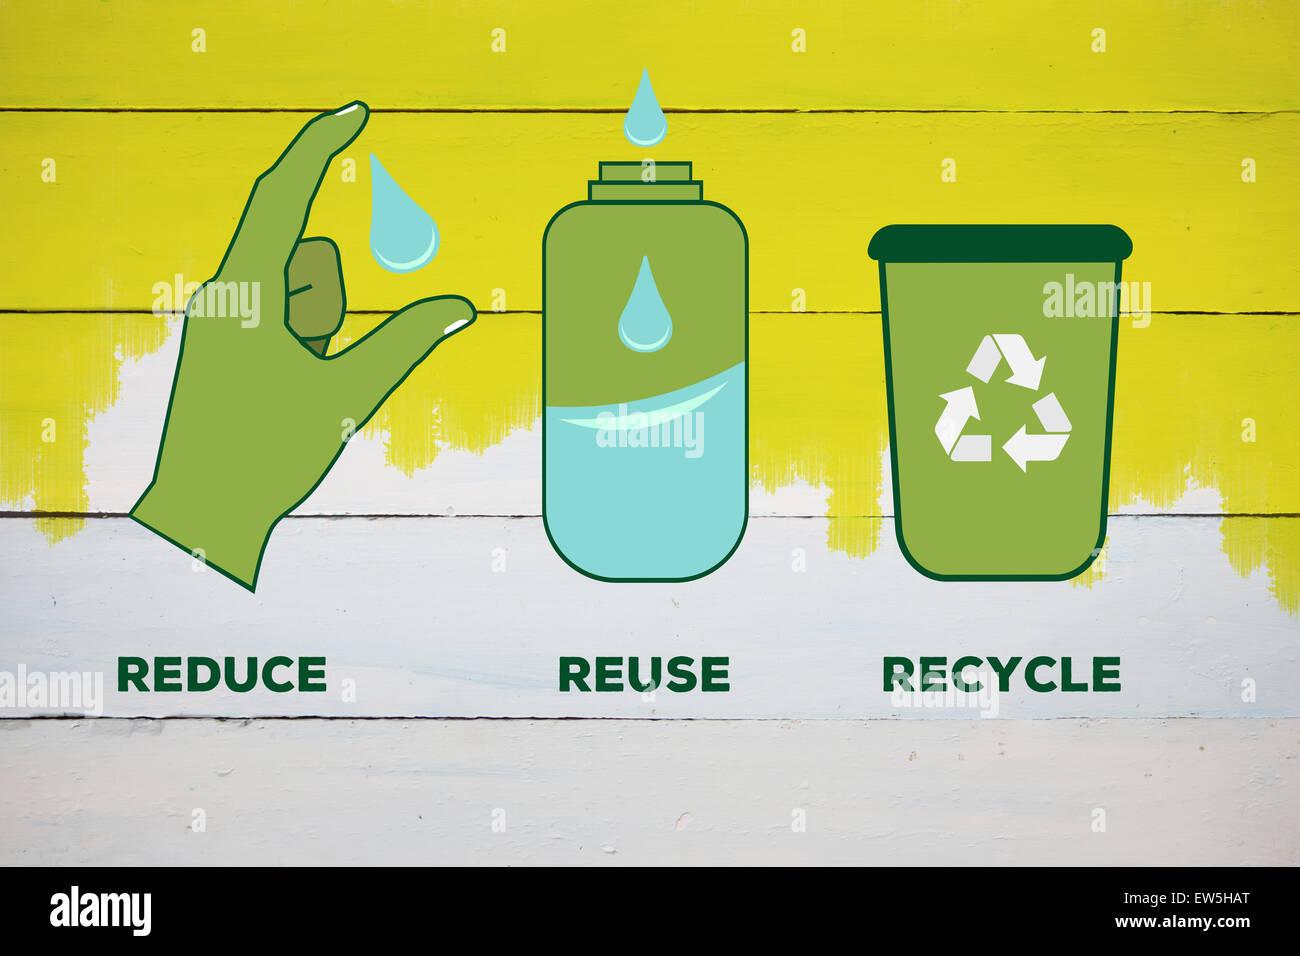 3c4723d4c Reduce Reuse Recycle Imágenes De Stock & Reduce Reuse Recycle Fotos ...